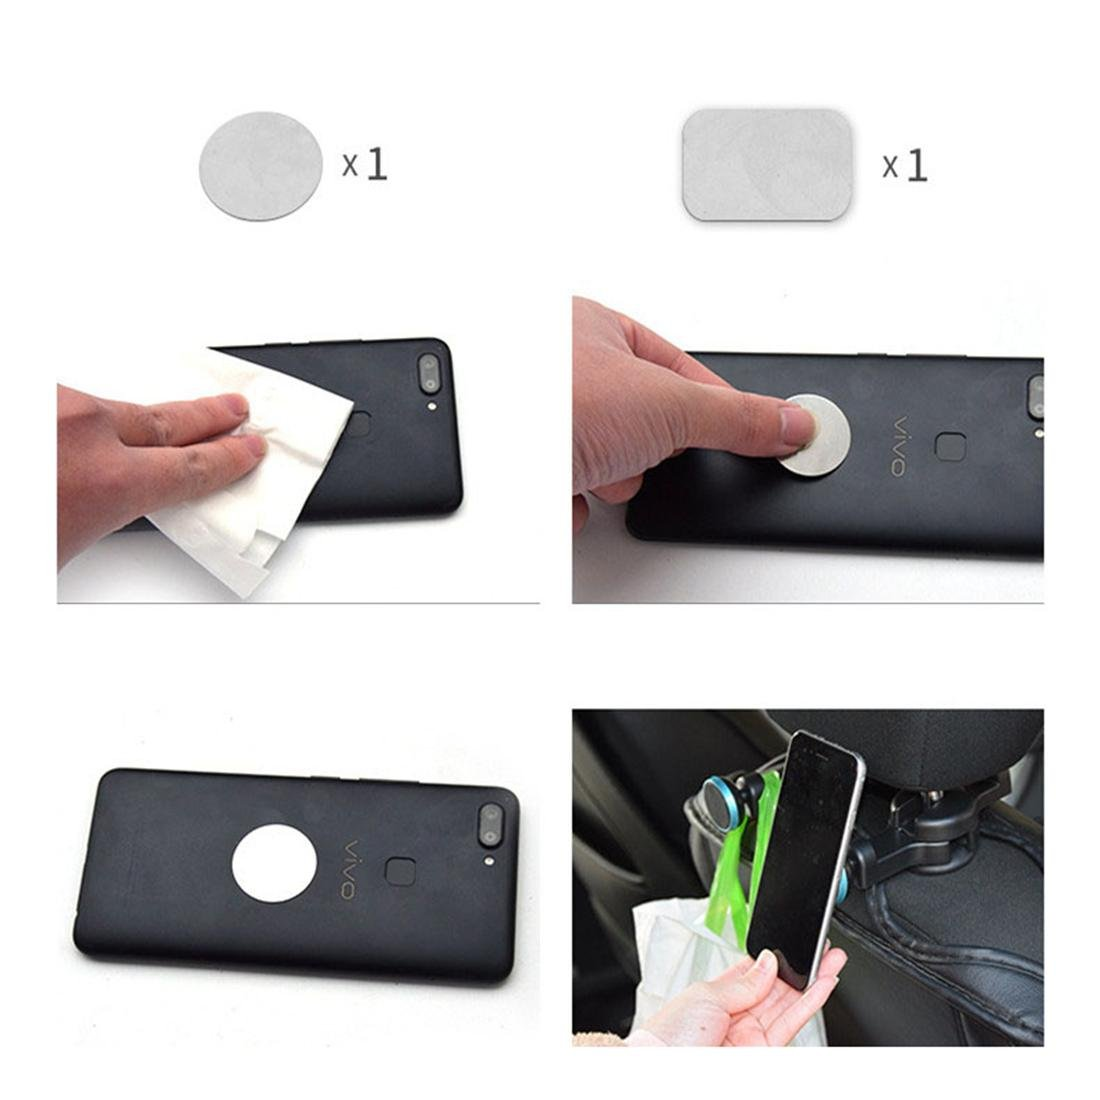 Auto Reposacabezas Montar Magnético Teléfono iPad Poseedor Coche SUV Asiento trasero Bolso Percha Gancho Universal Tableta Organizador , Blue: Amazon.es: ...